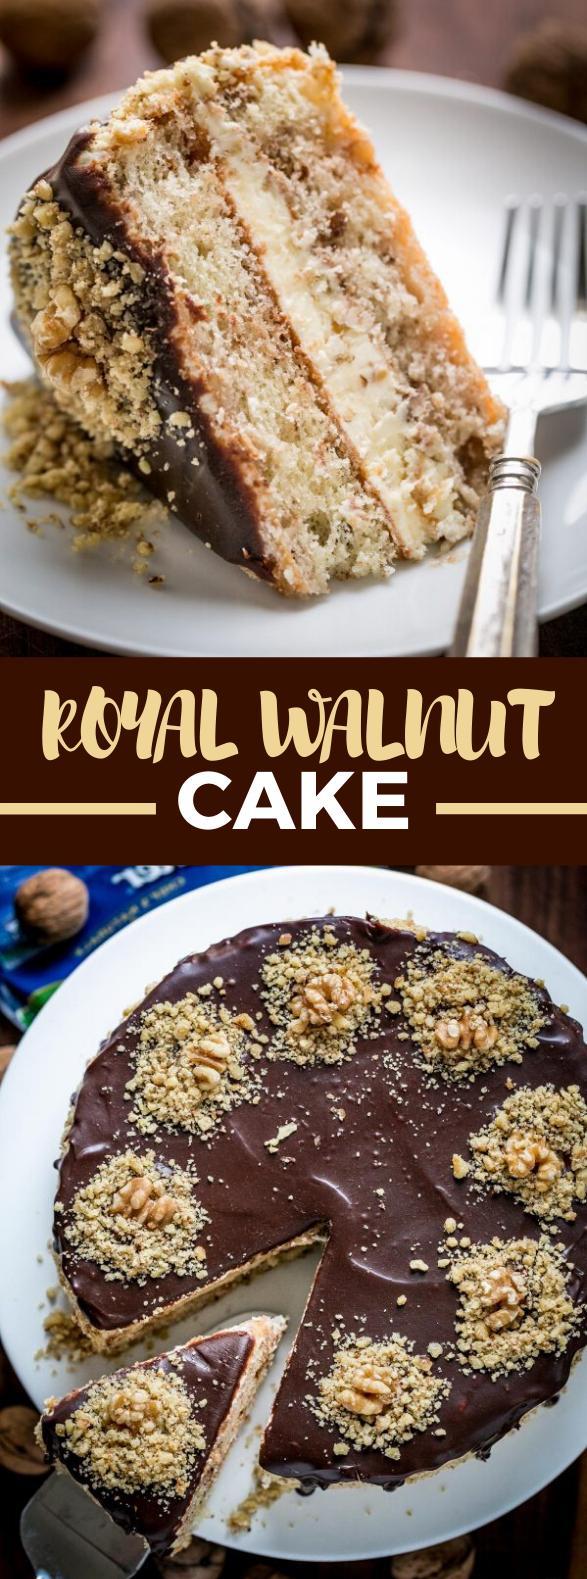 Royal Walnut Cake #chocolate #desserts